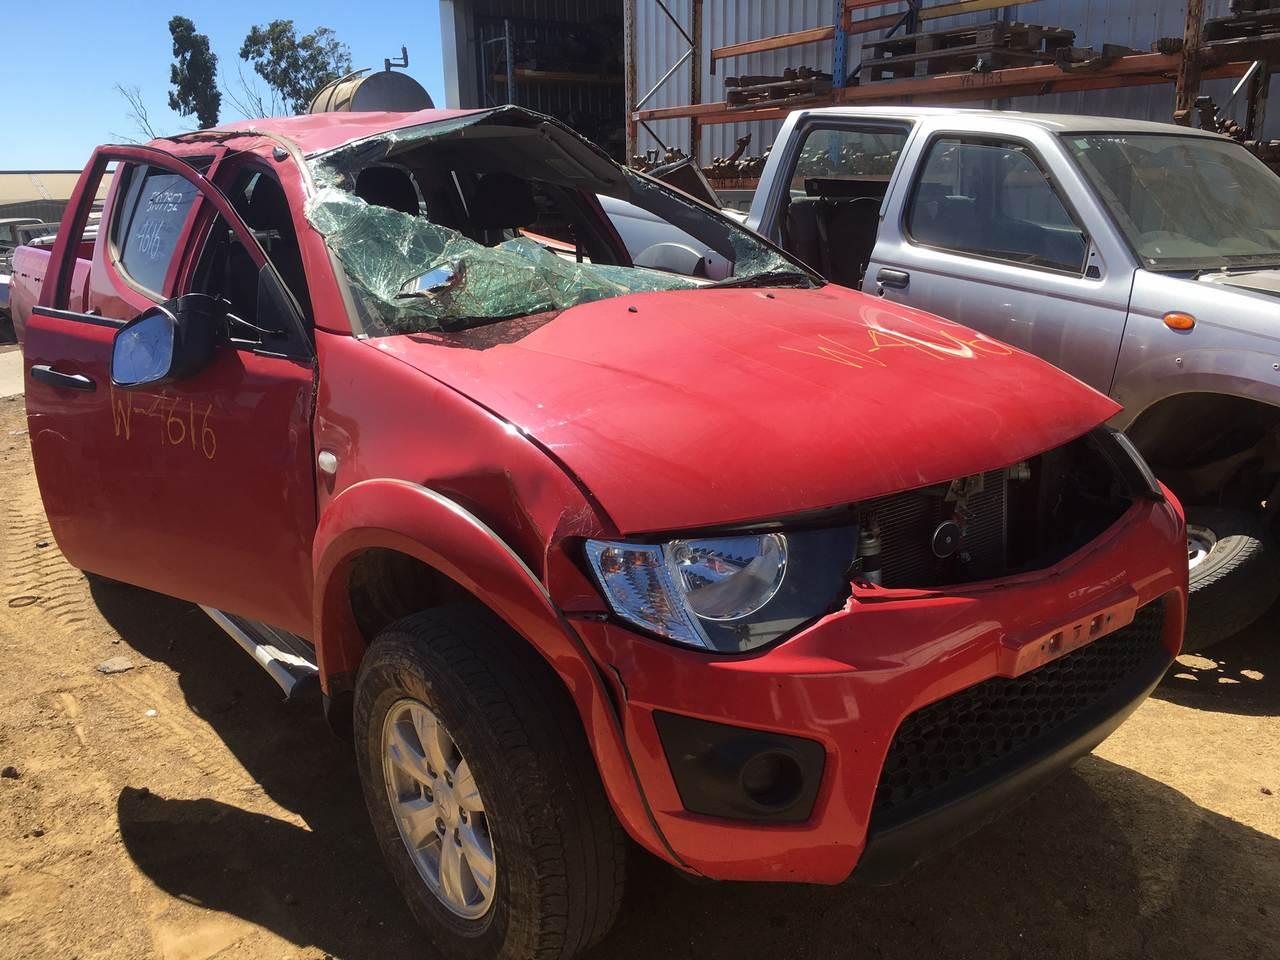 Damaged Repairable: Cars | eBay